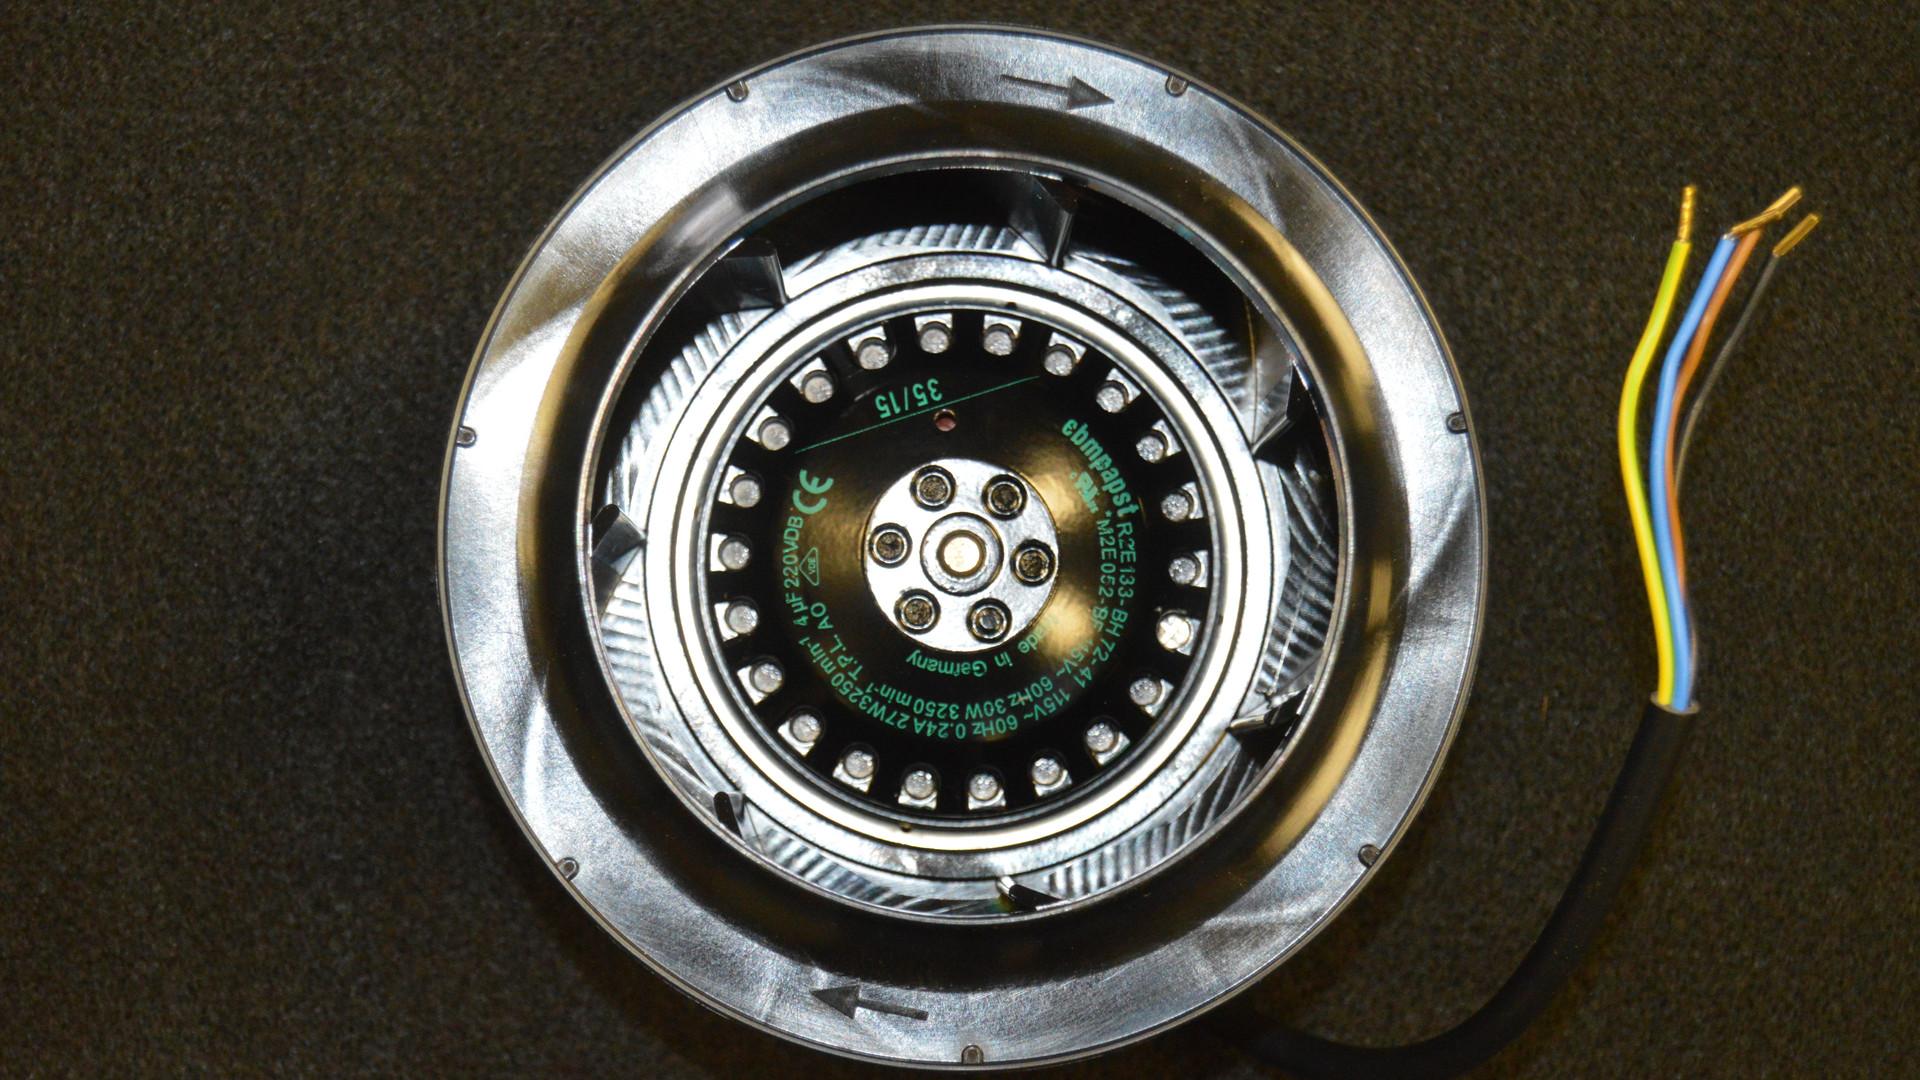 DSC_2622.JPG